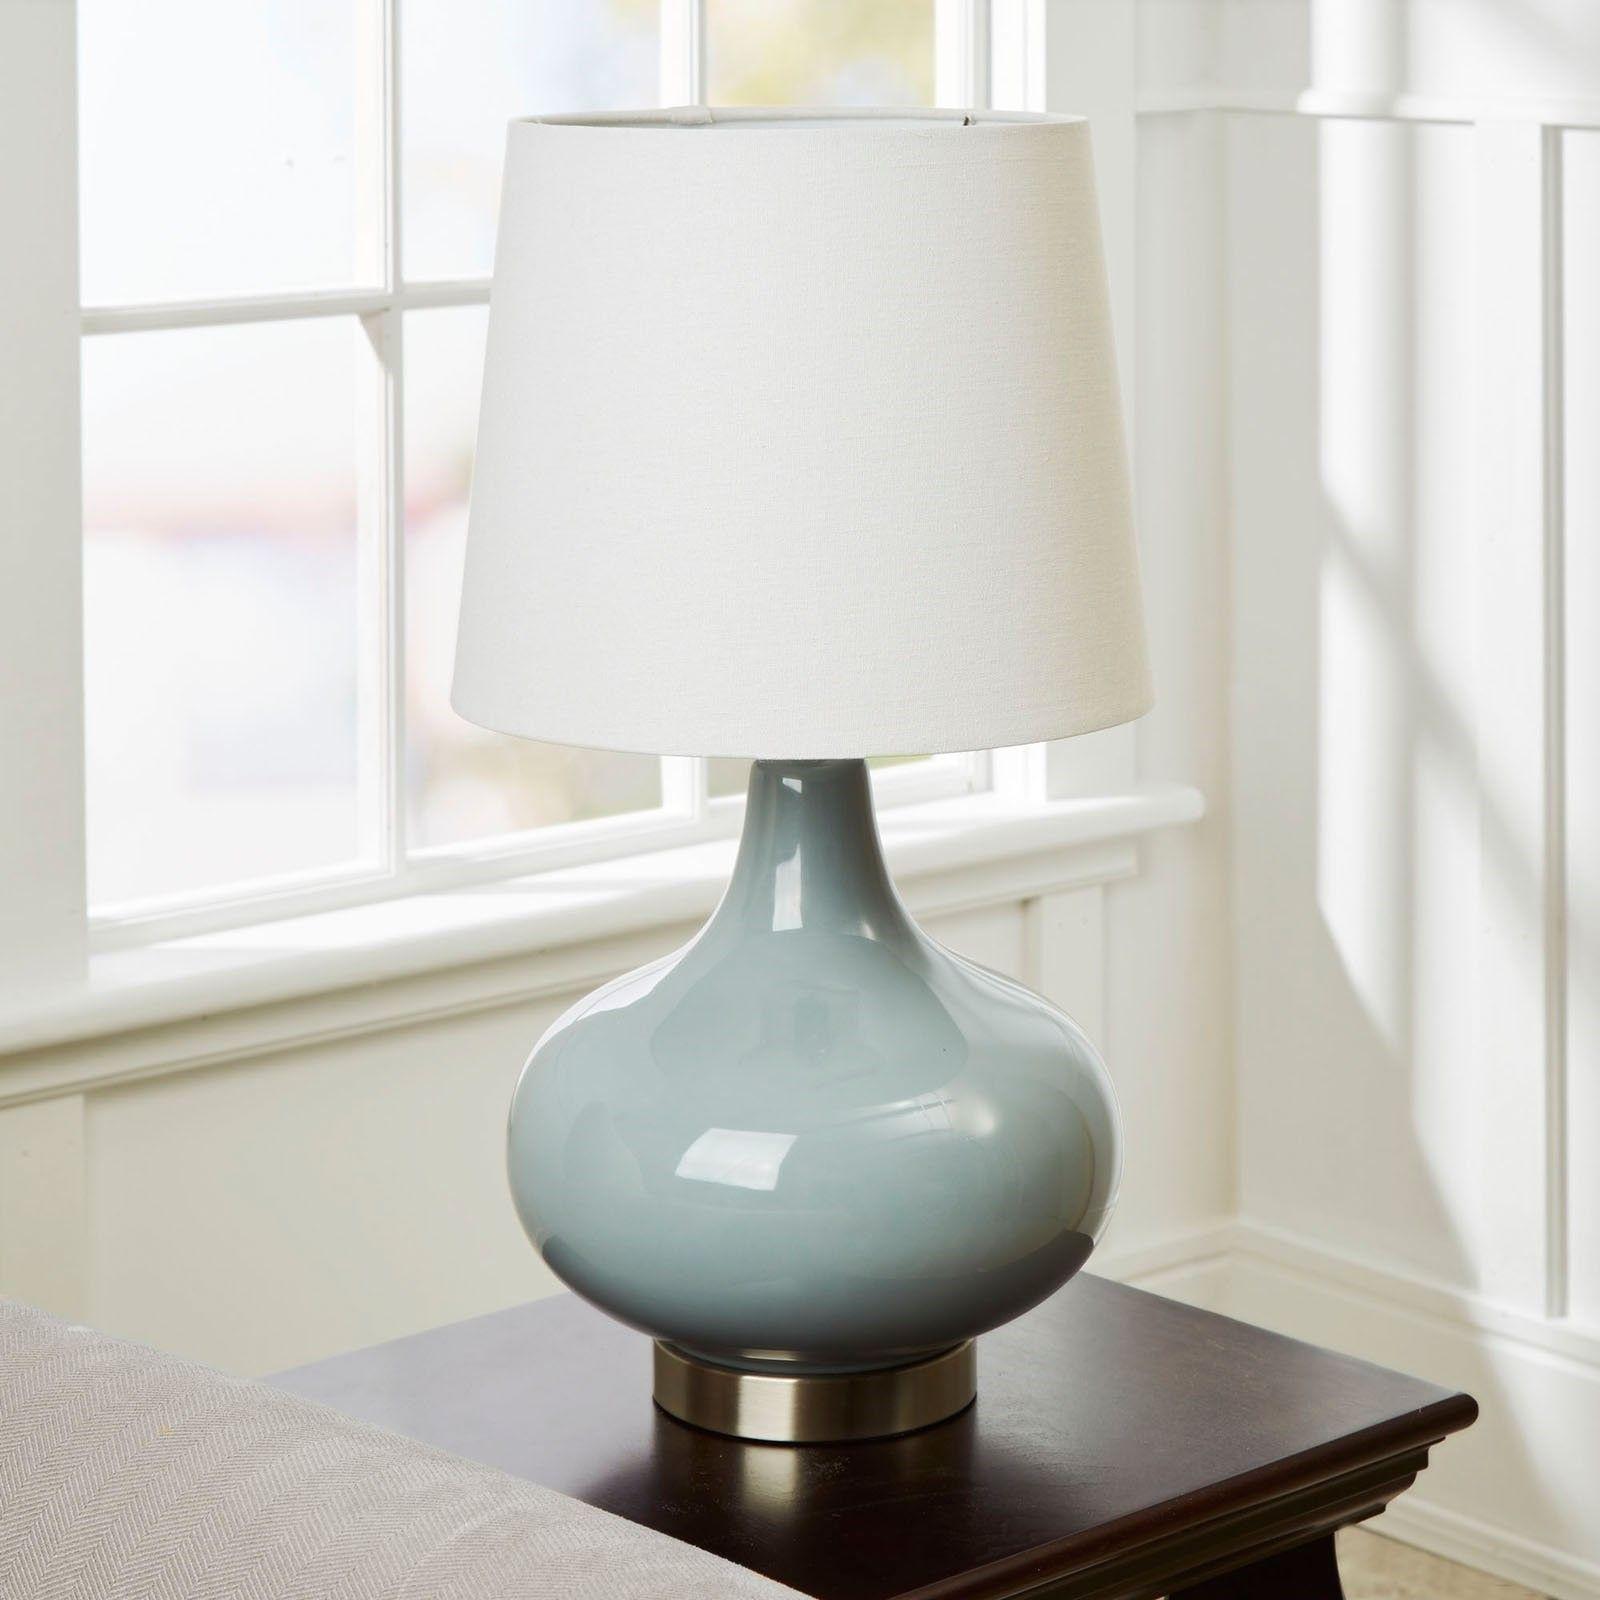 9177d060e999a8a4b63f27909136d862 - Better Homes & Gardens Ceramic Table Lamp